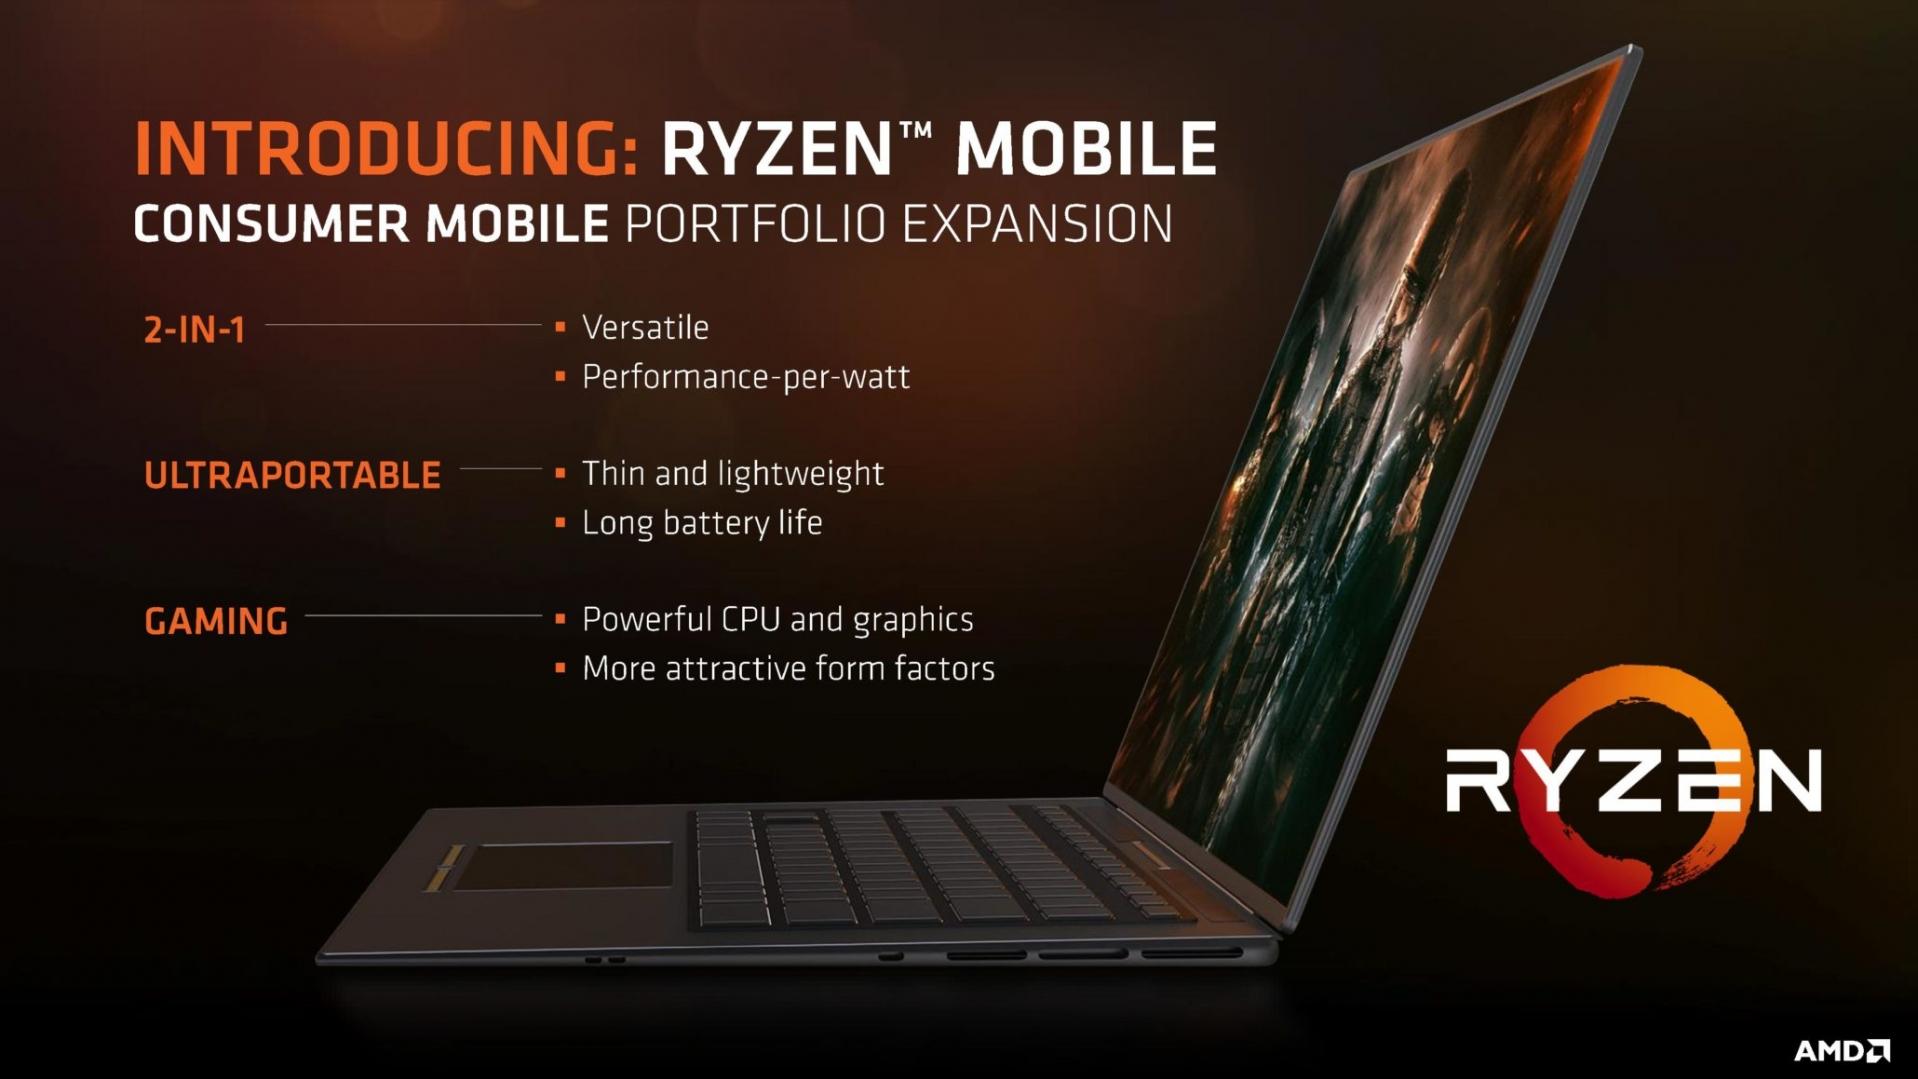 AMD releases Ryzen 5 2600H and Ryzen 7 2800H specifications